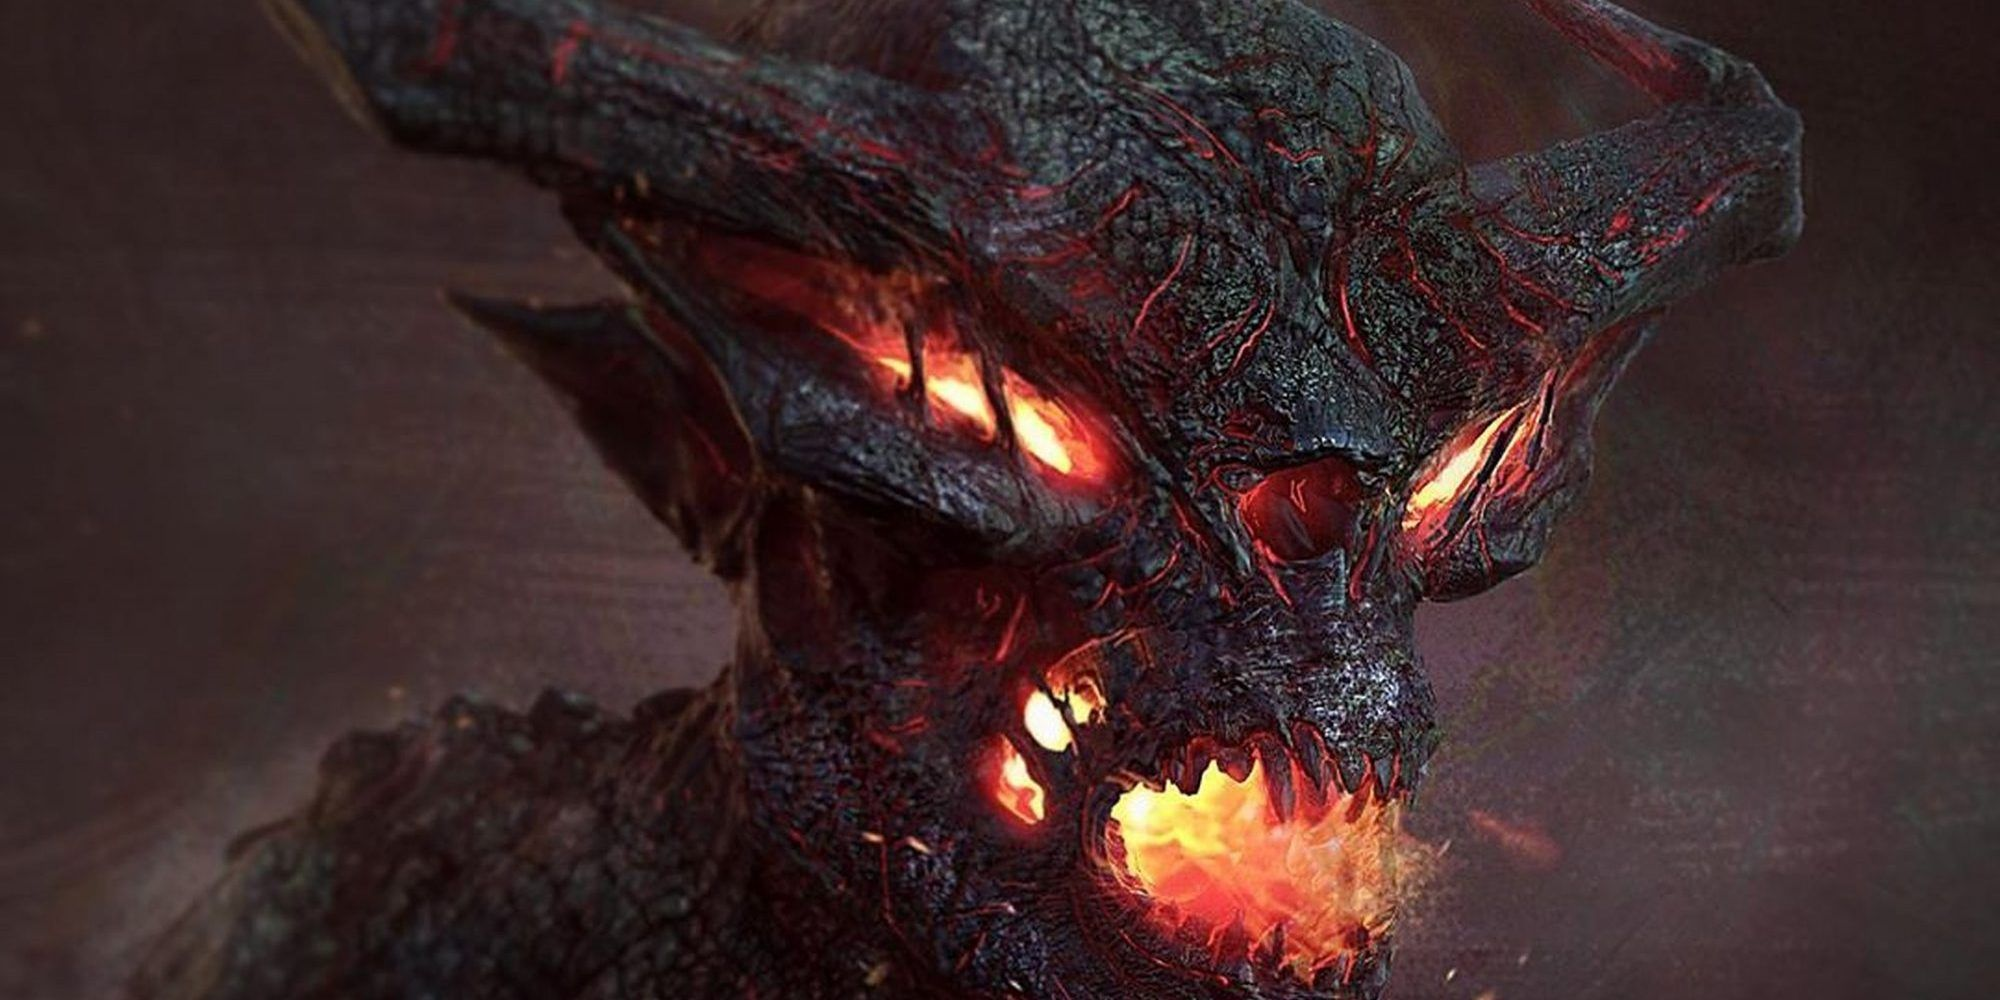 Thor: Ragnarok's Unused Fire Demon Concept Art is Pure Nightmare Fuel